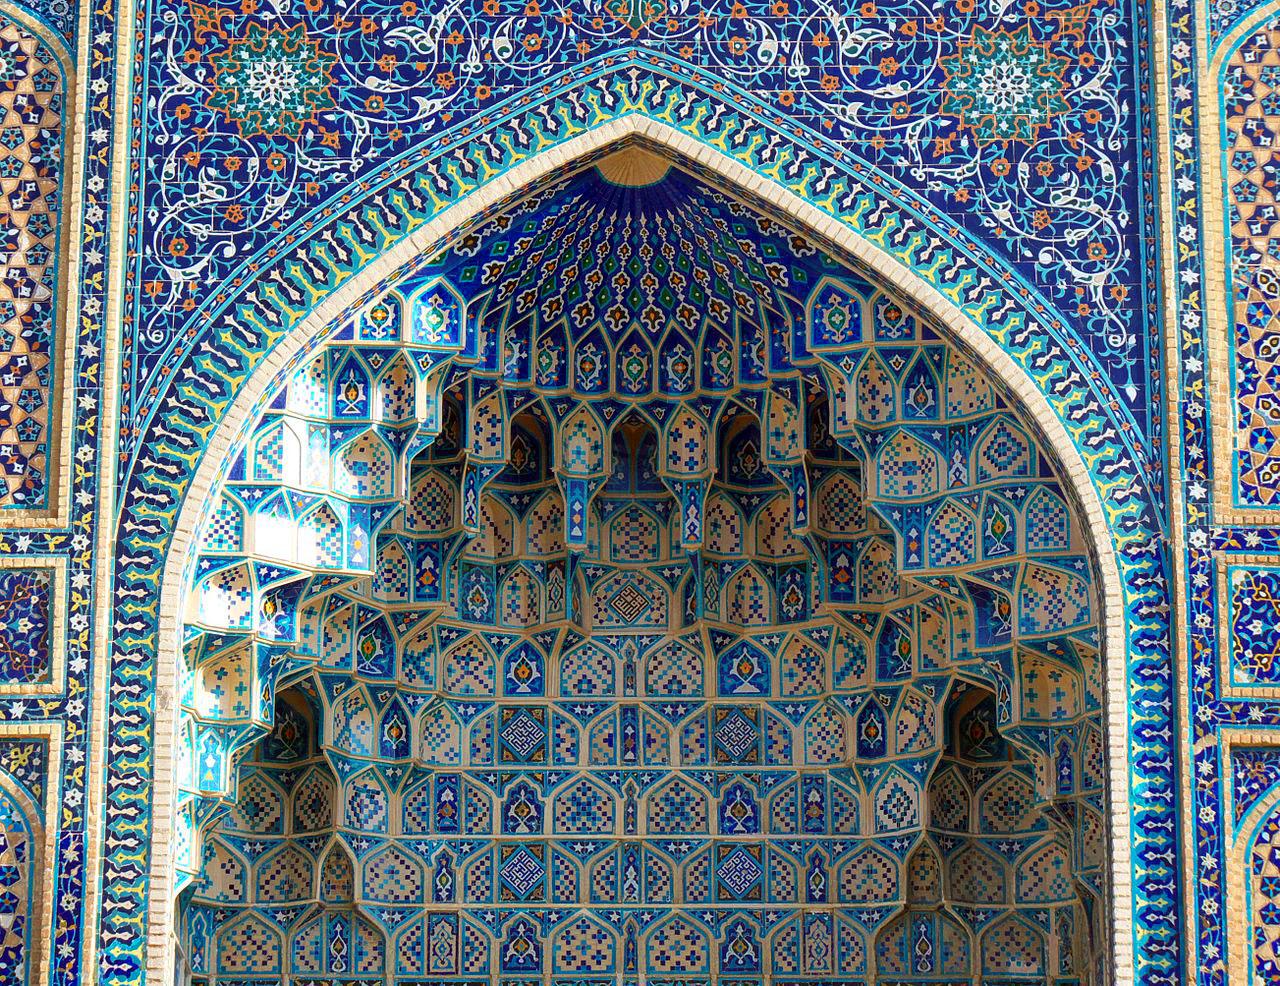 самаркандская мозаика